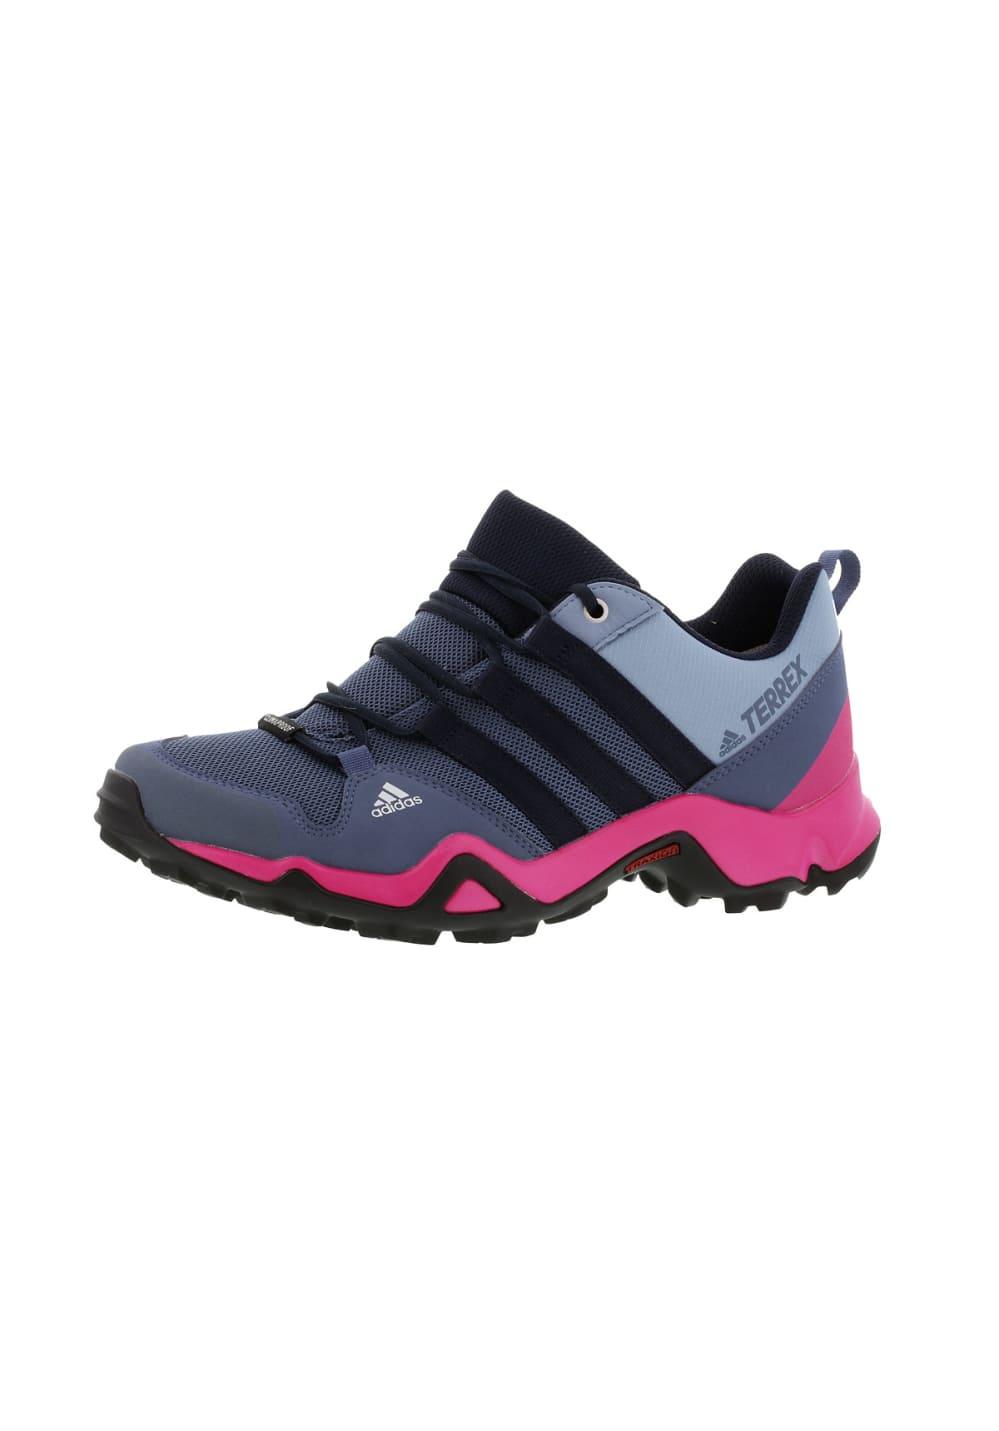 adidas TERREX Ax2r Climaproof - Outdoorschuhe - Blau